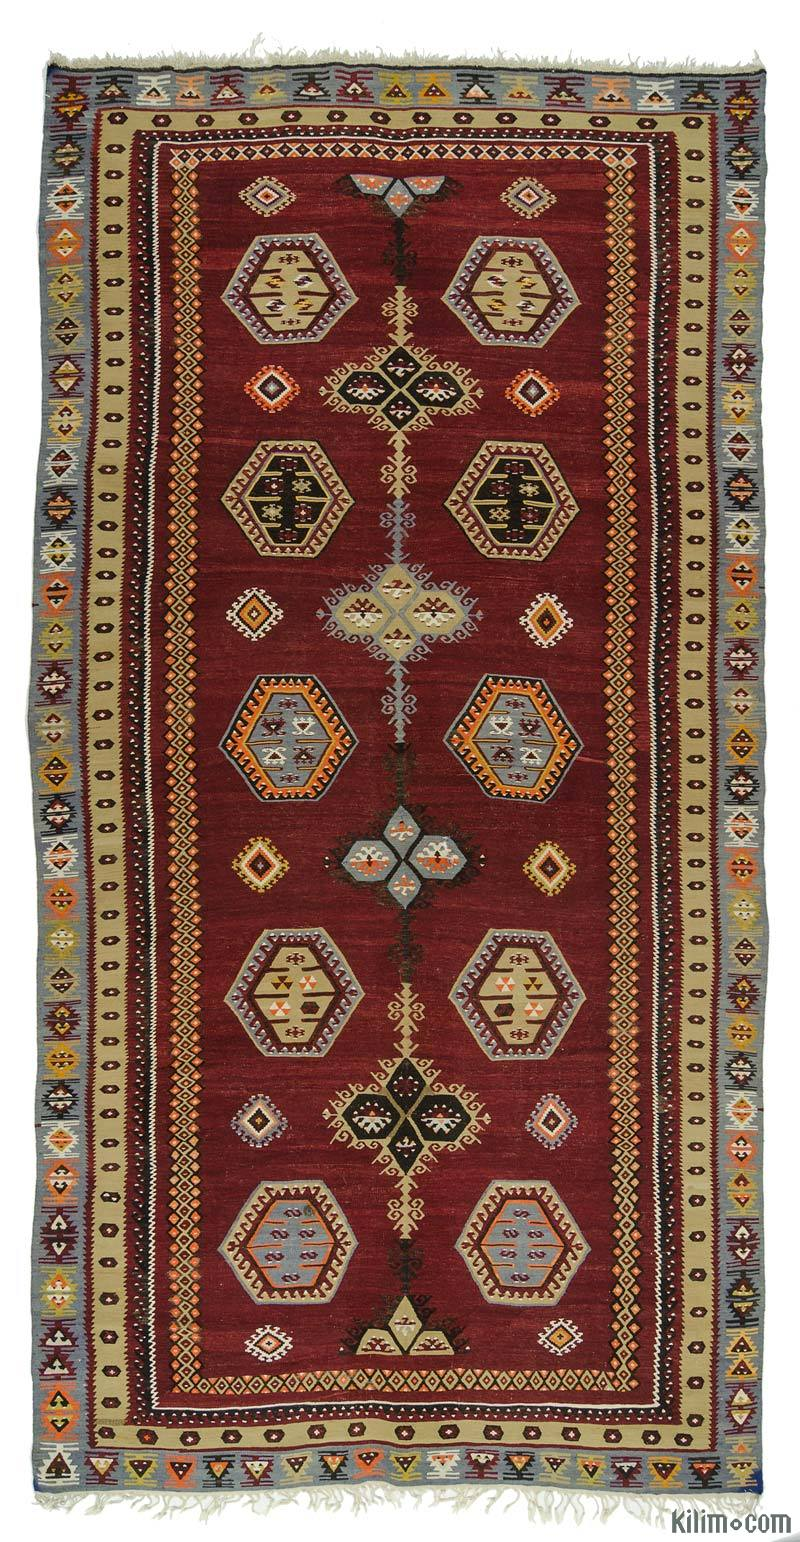 K0016013 Red Vintage Sarkisla Kilim Rug  6 x 118 72